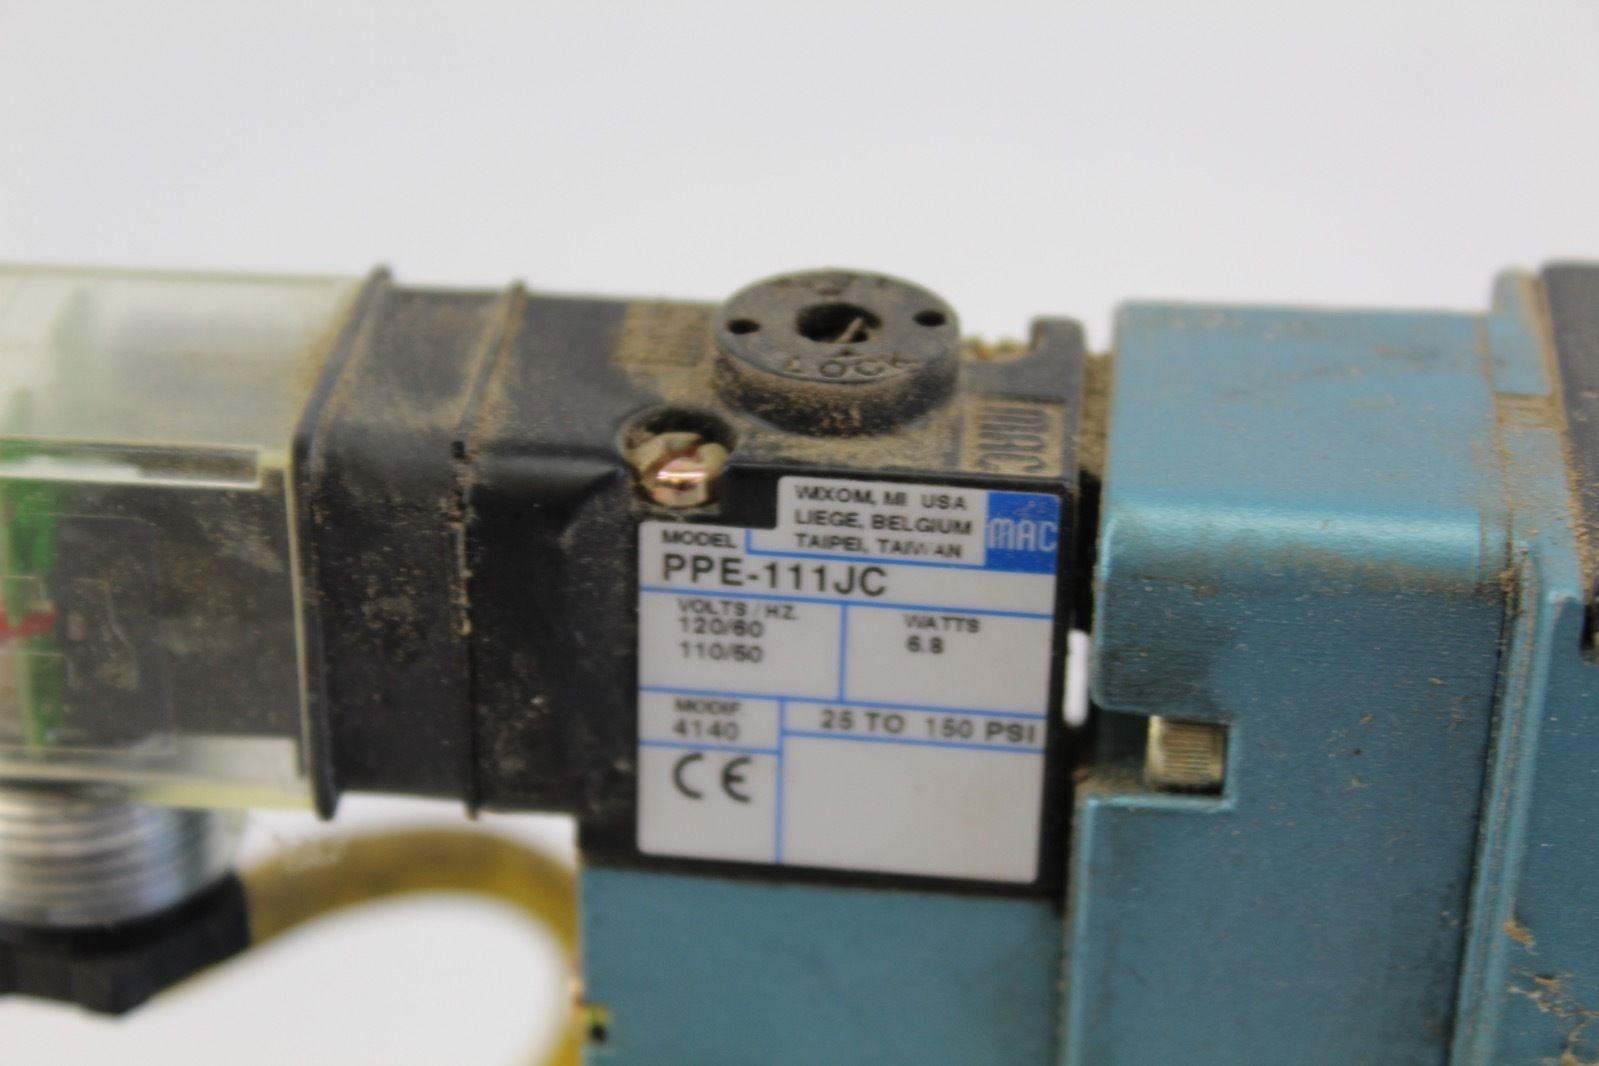 Mac Servo Valve MV-A2B-A111-PP-111JC with connector PPE-111JC *used* (B235) 3